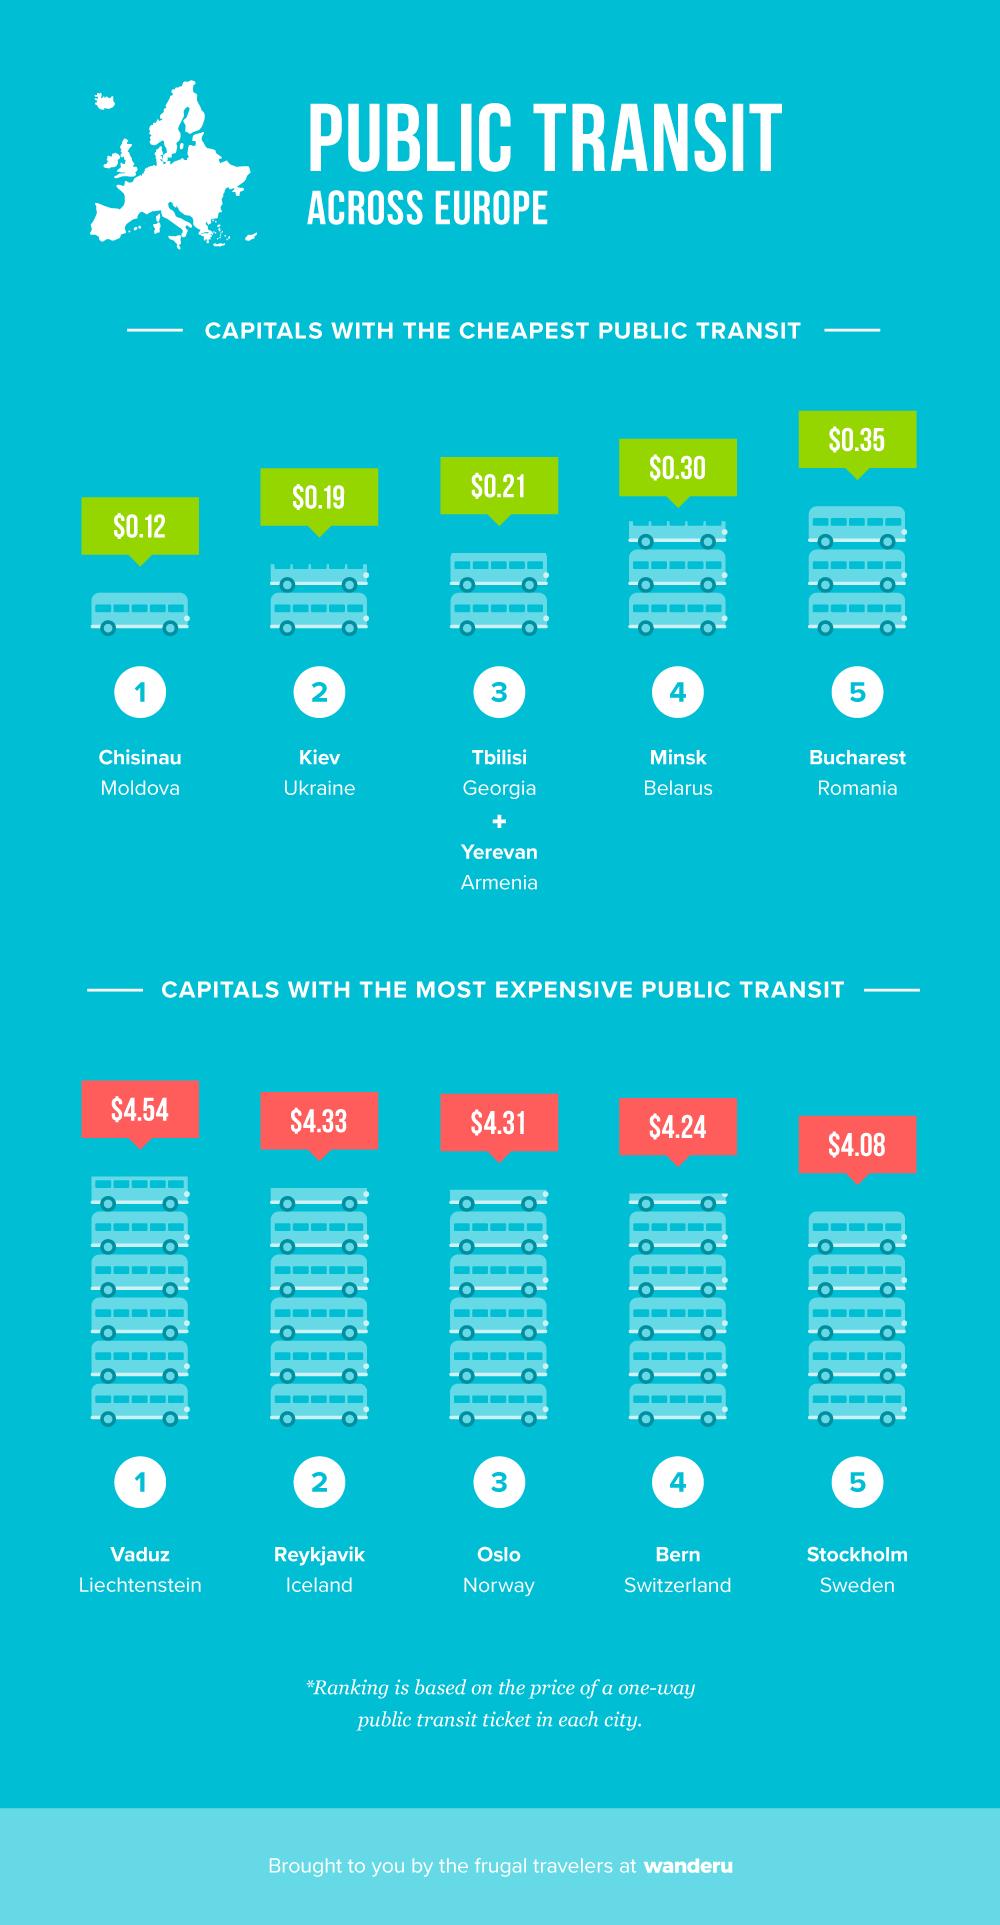 Public transit fares across Europe.